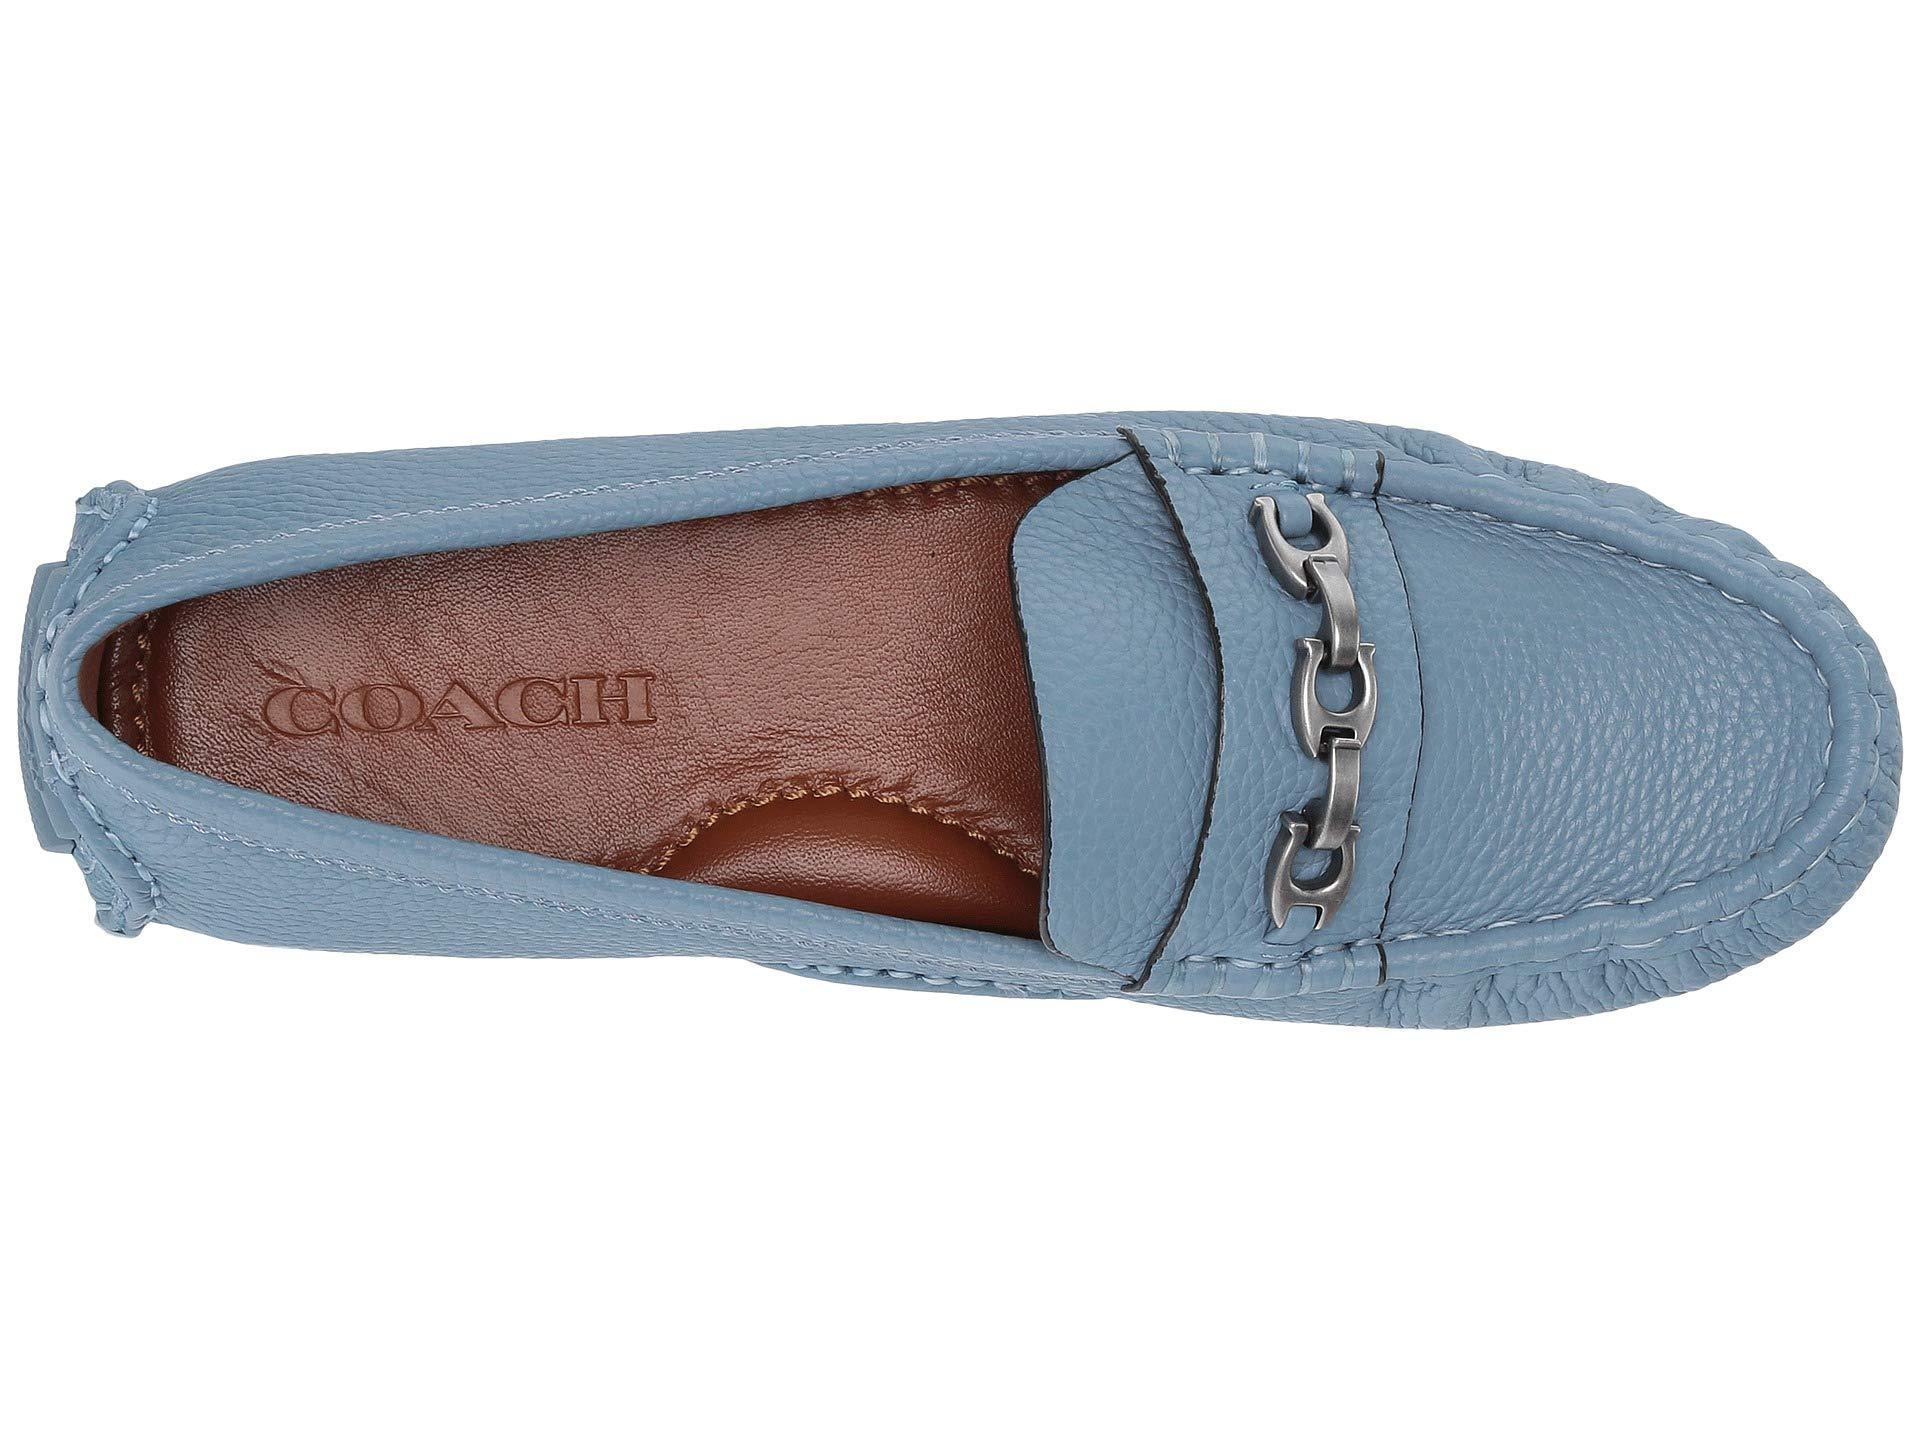 d7c66c28d29 COACH - Blue Crosby Driver (chalk Leather) Women s Slip On Shoes - Lyst.  View fullscreen